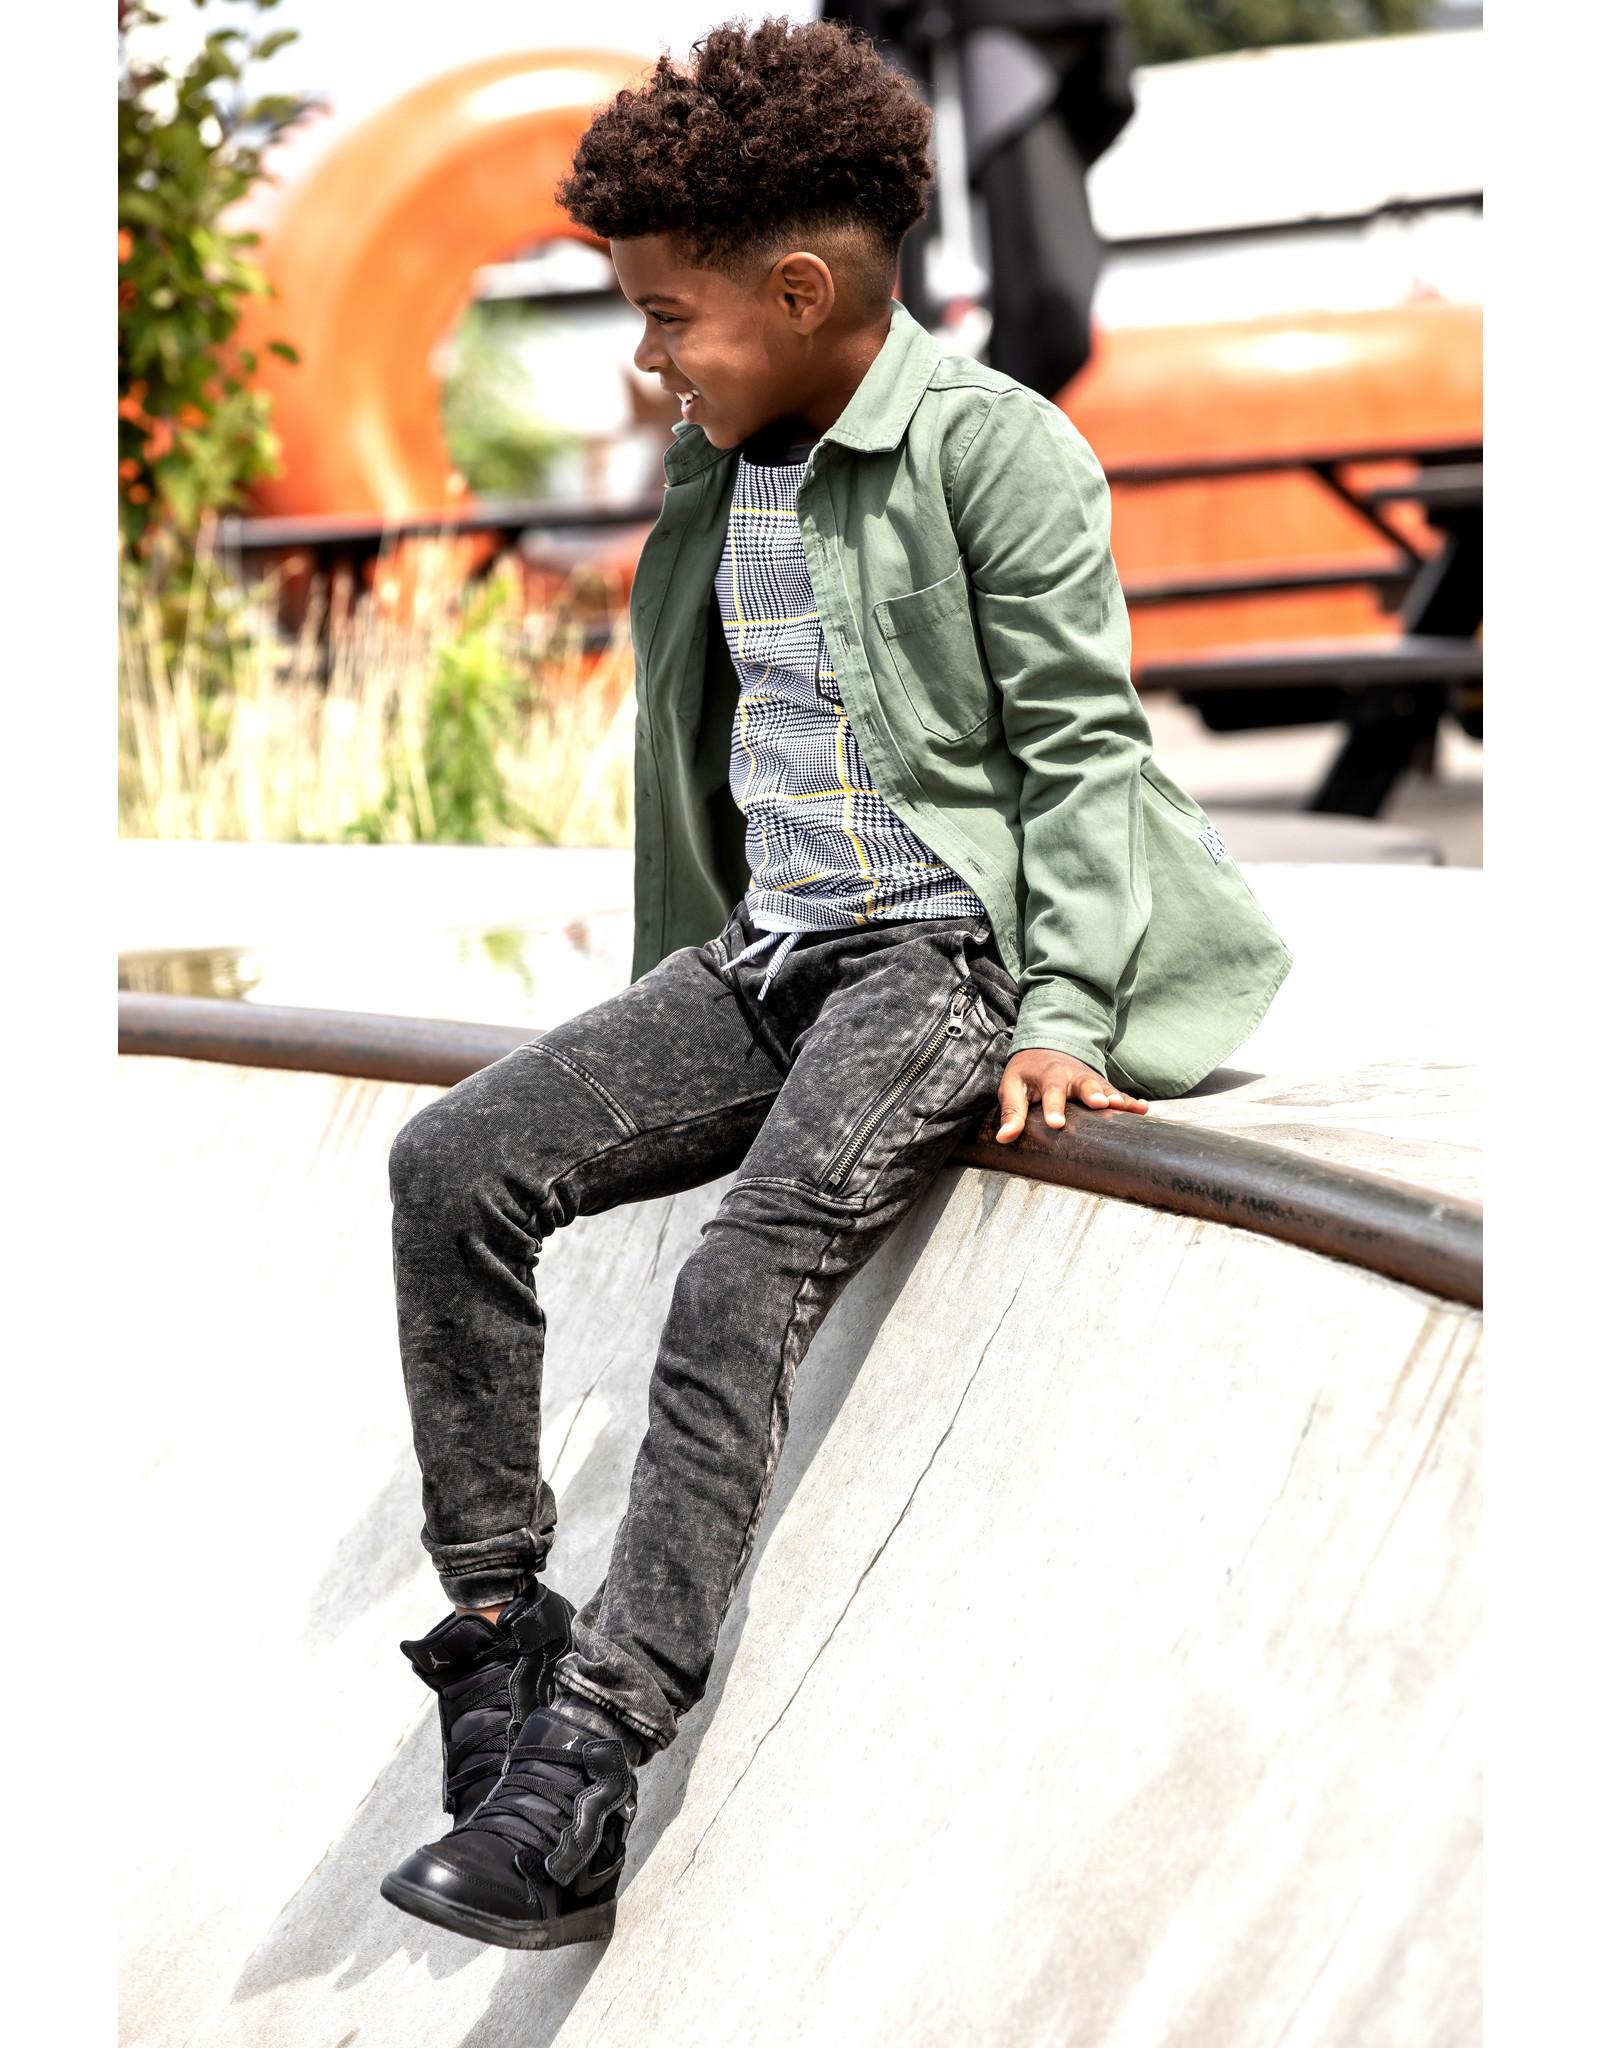 B-Nosy Boys sweat pants with zipper details and check aop stroke detail, black denim